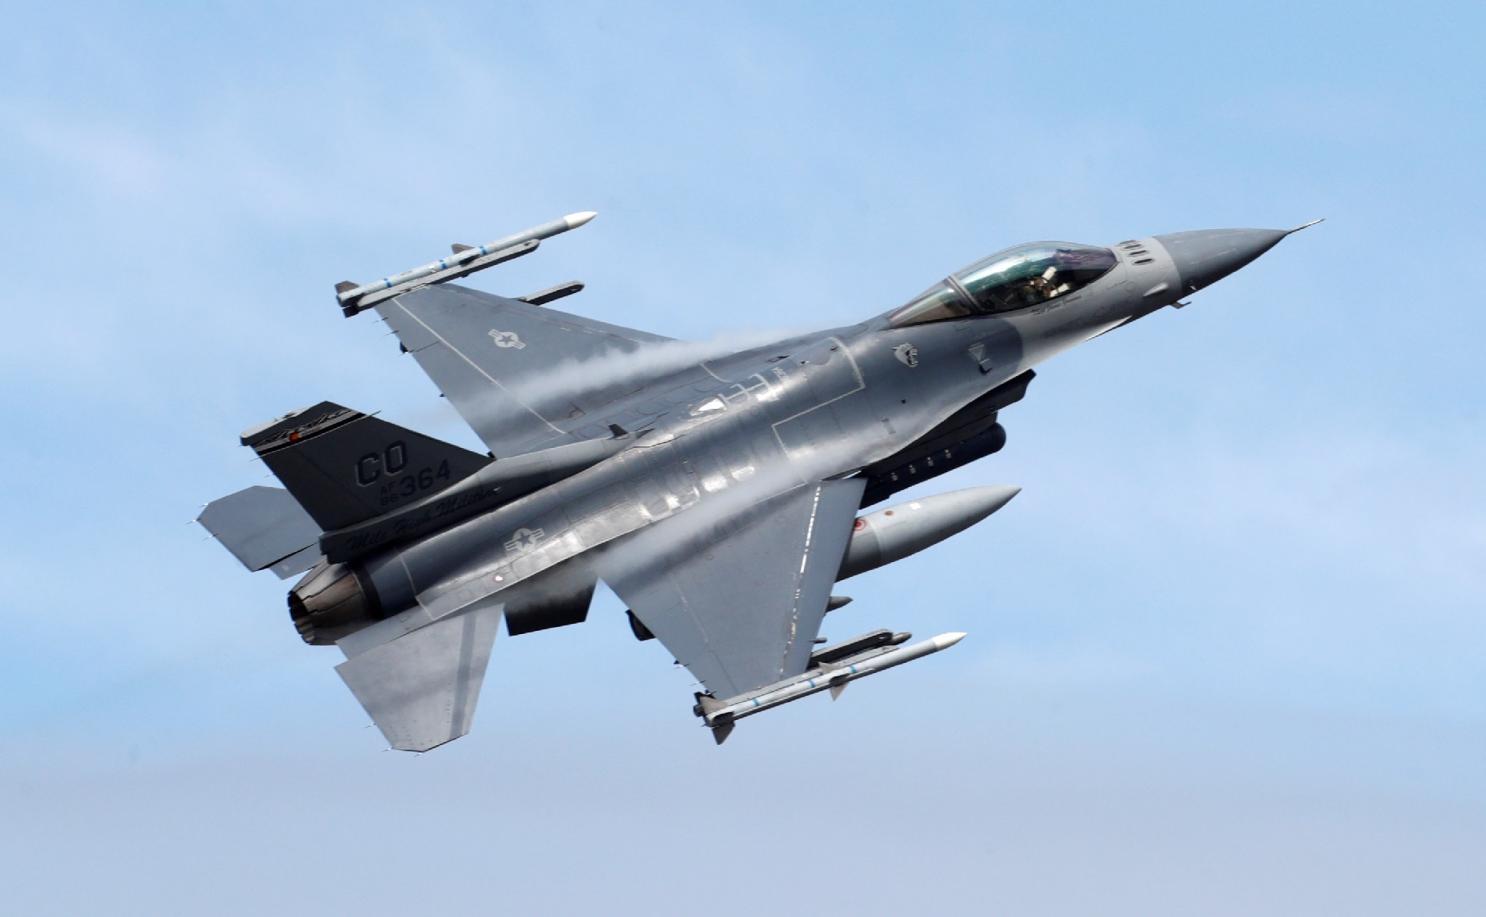 F-16 images